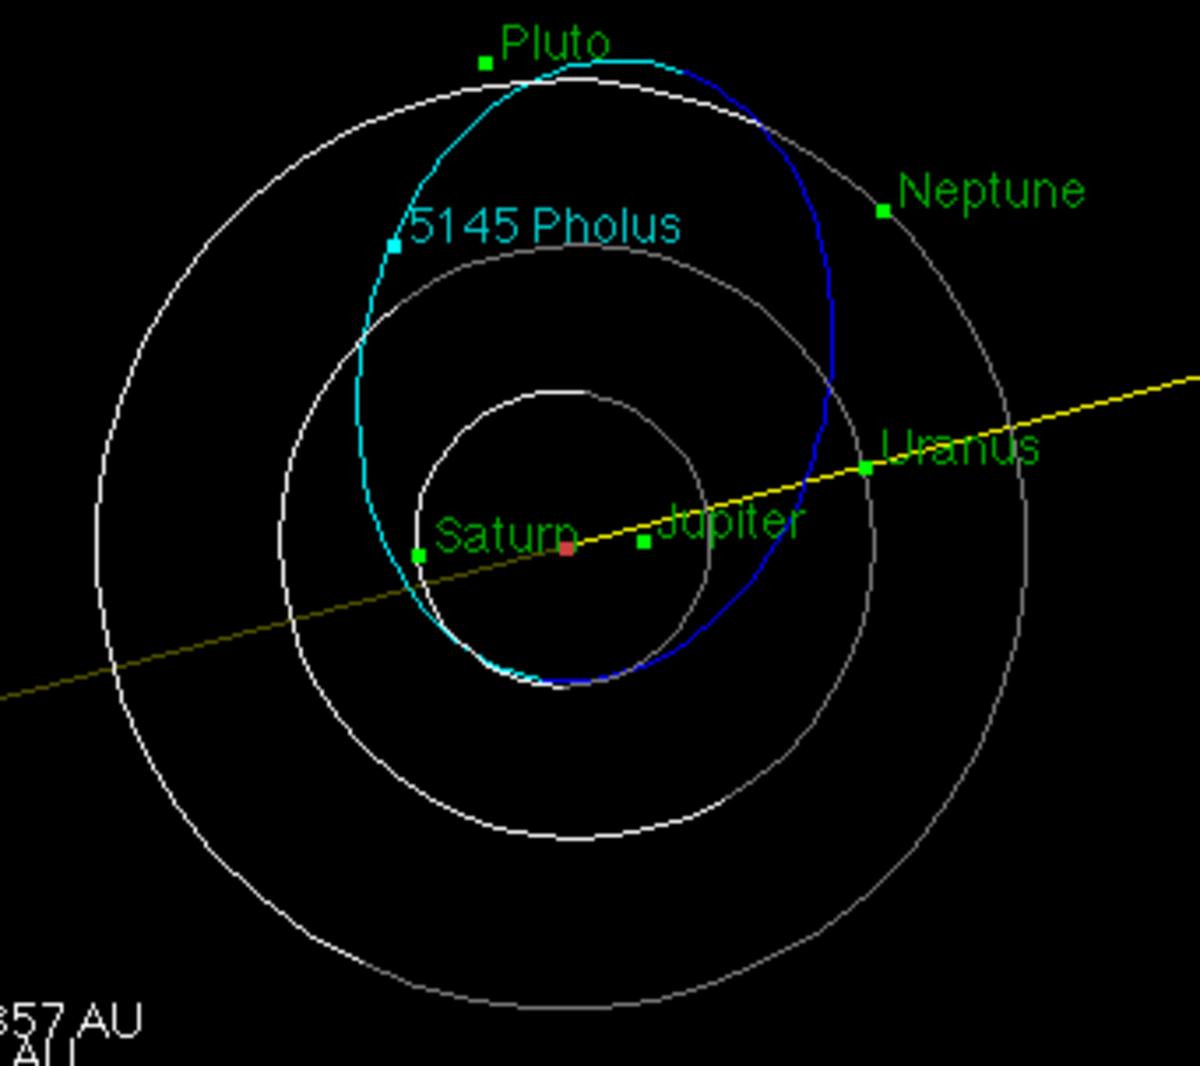 5145 Pholus Wikipedia